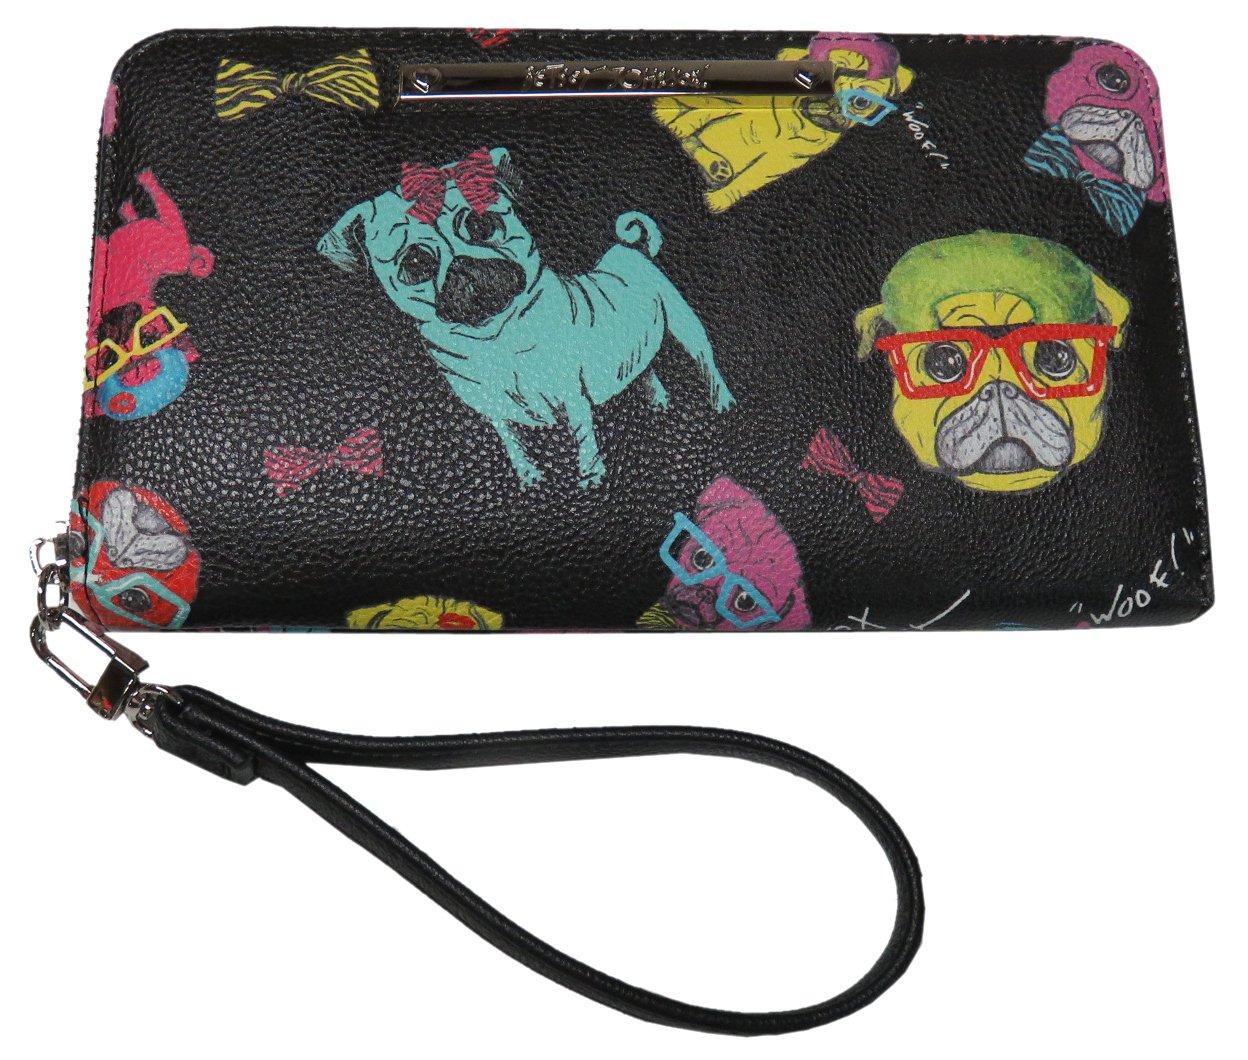 Betsey Johnson Pug Dog Wristlet Multi Compartment Wallet